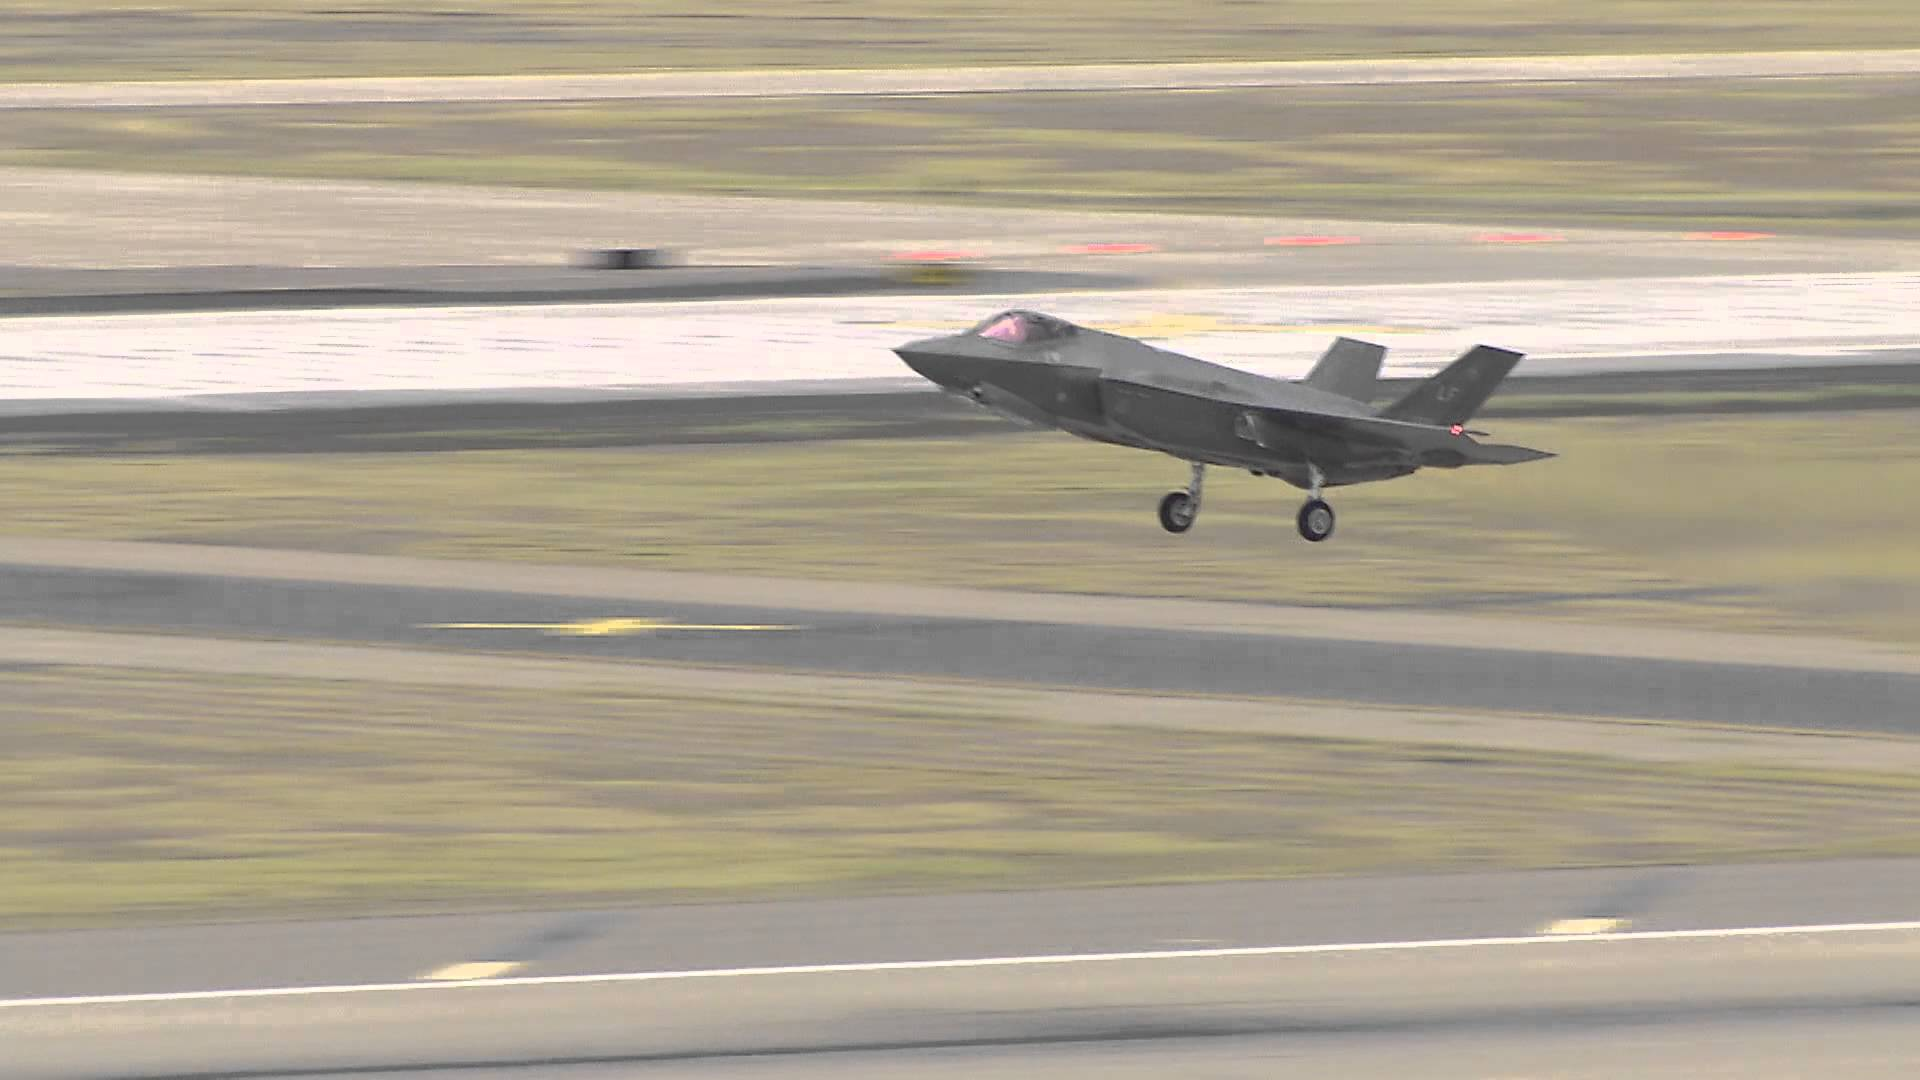 Lockheed Martin's F-35 Lightning II in Operation